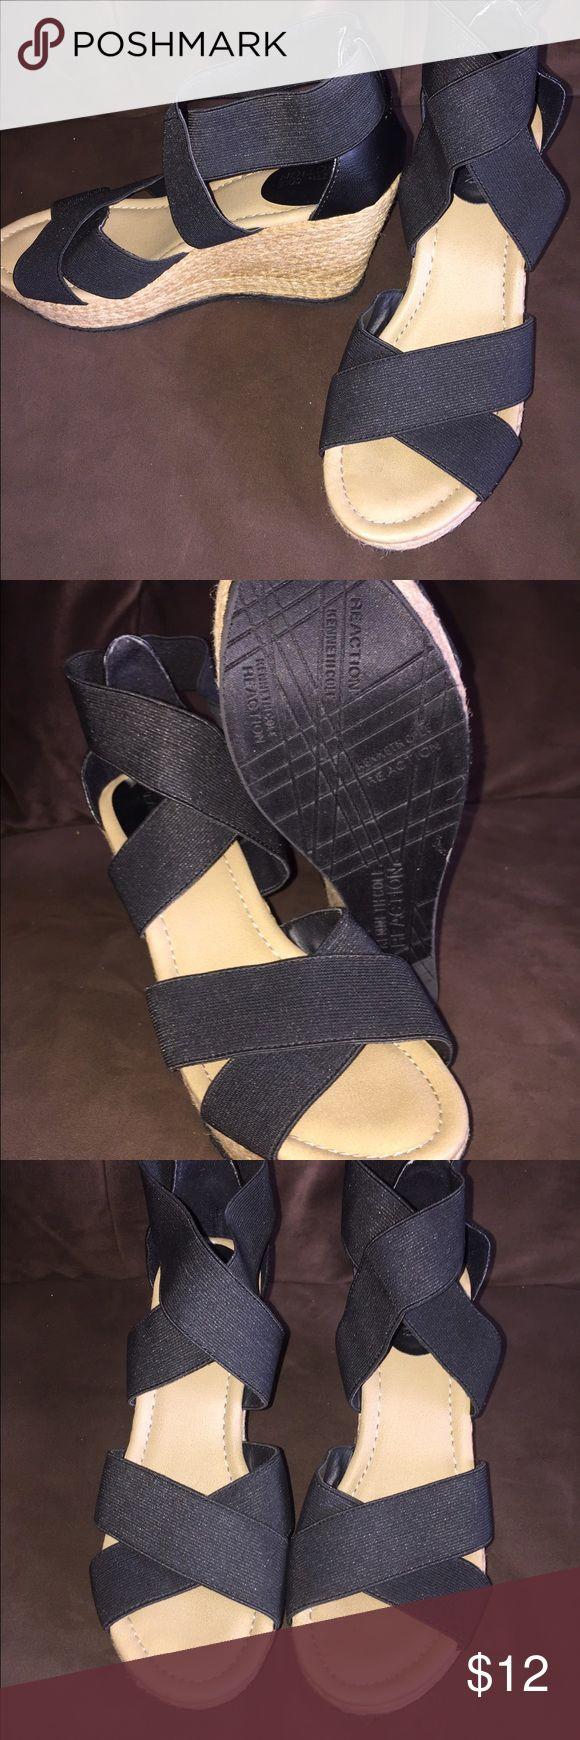 Ladies wedge sandals Kenneth Cole Black stretch wrap wedge sandals 3.5in. heel Kenneth Cole Shoes Espadrilles